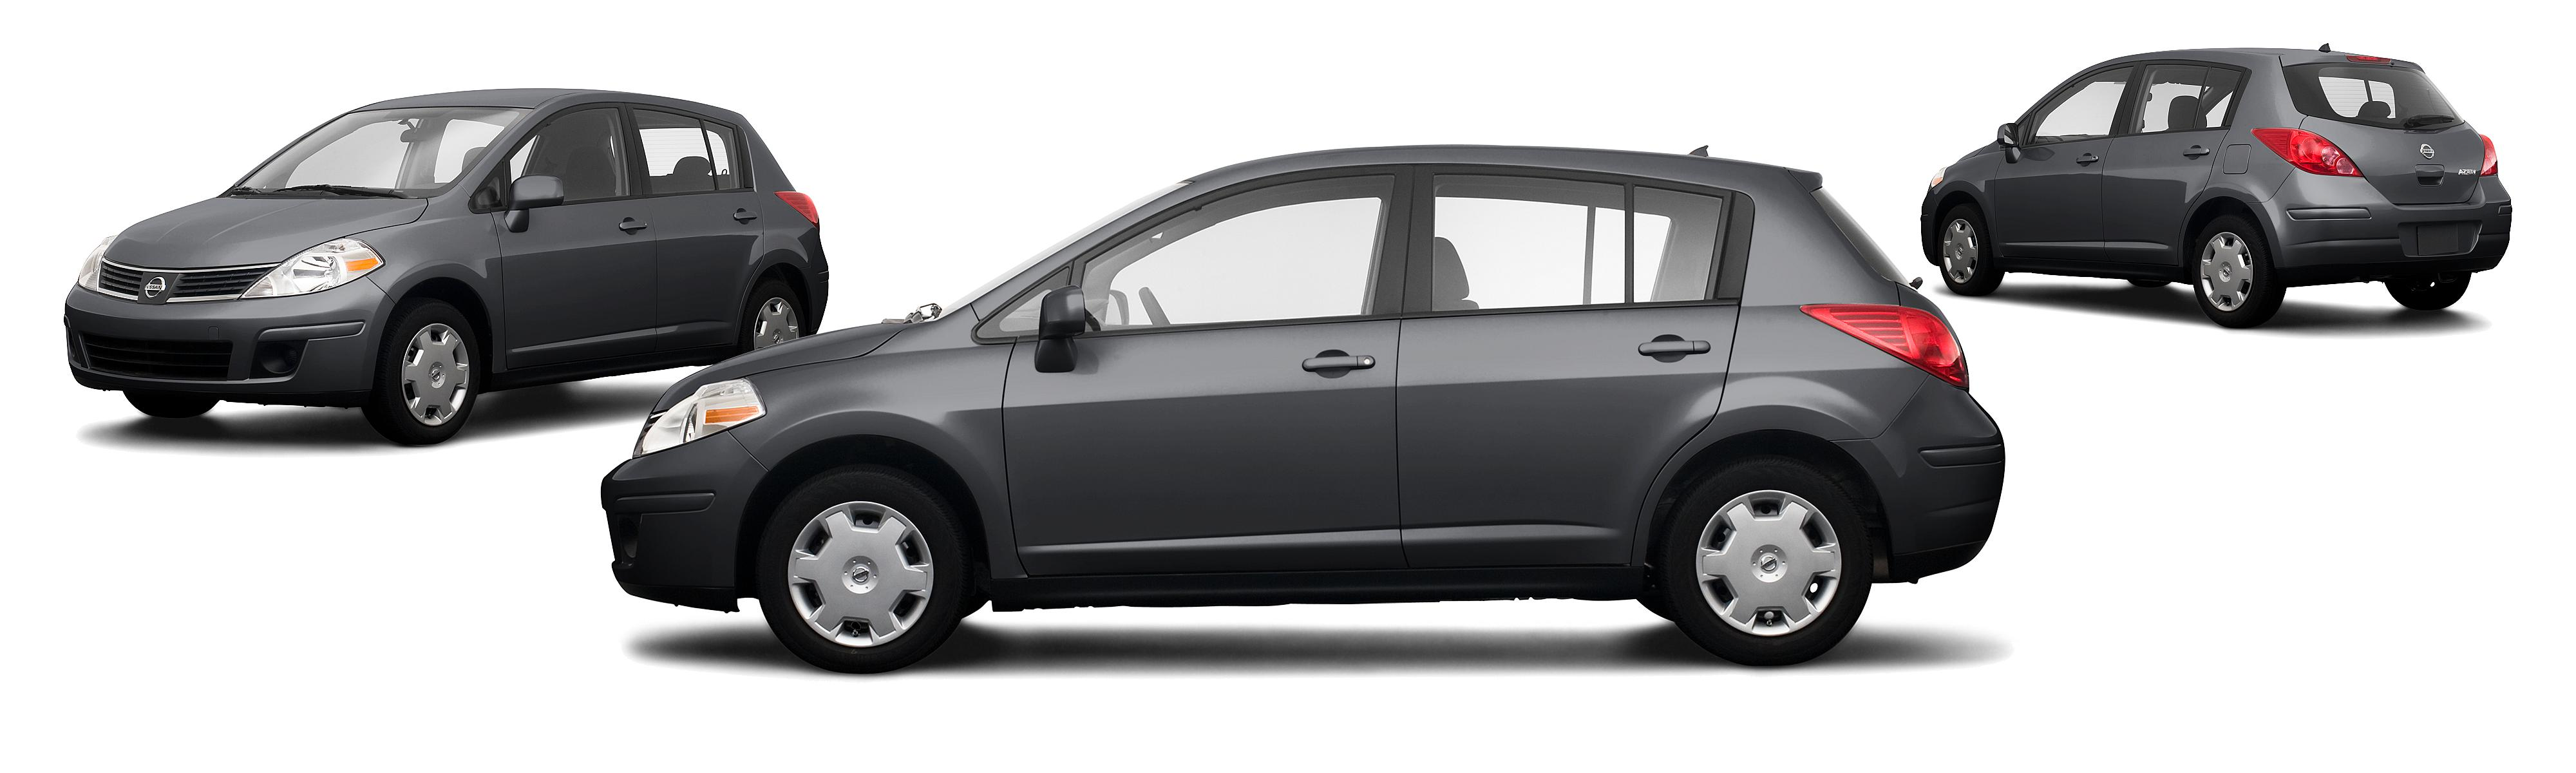 2009 Nissan Versa 1 8 S 4dr Hatchback 6m Research Groovecar